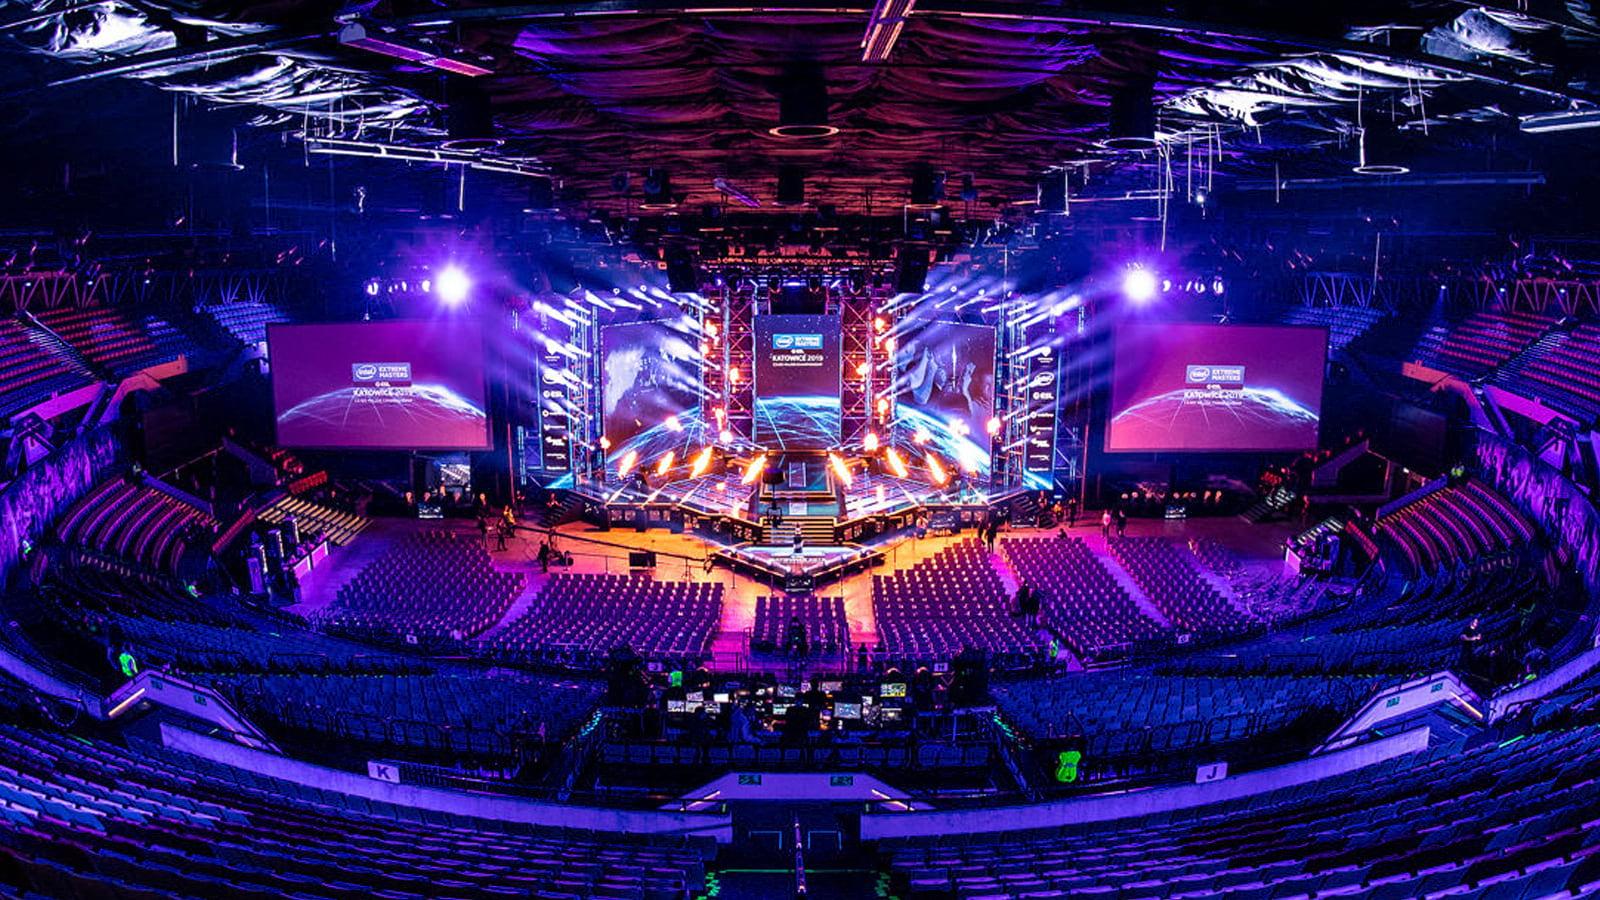 IEM Katowice arena empty